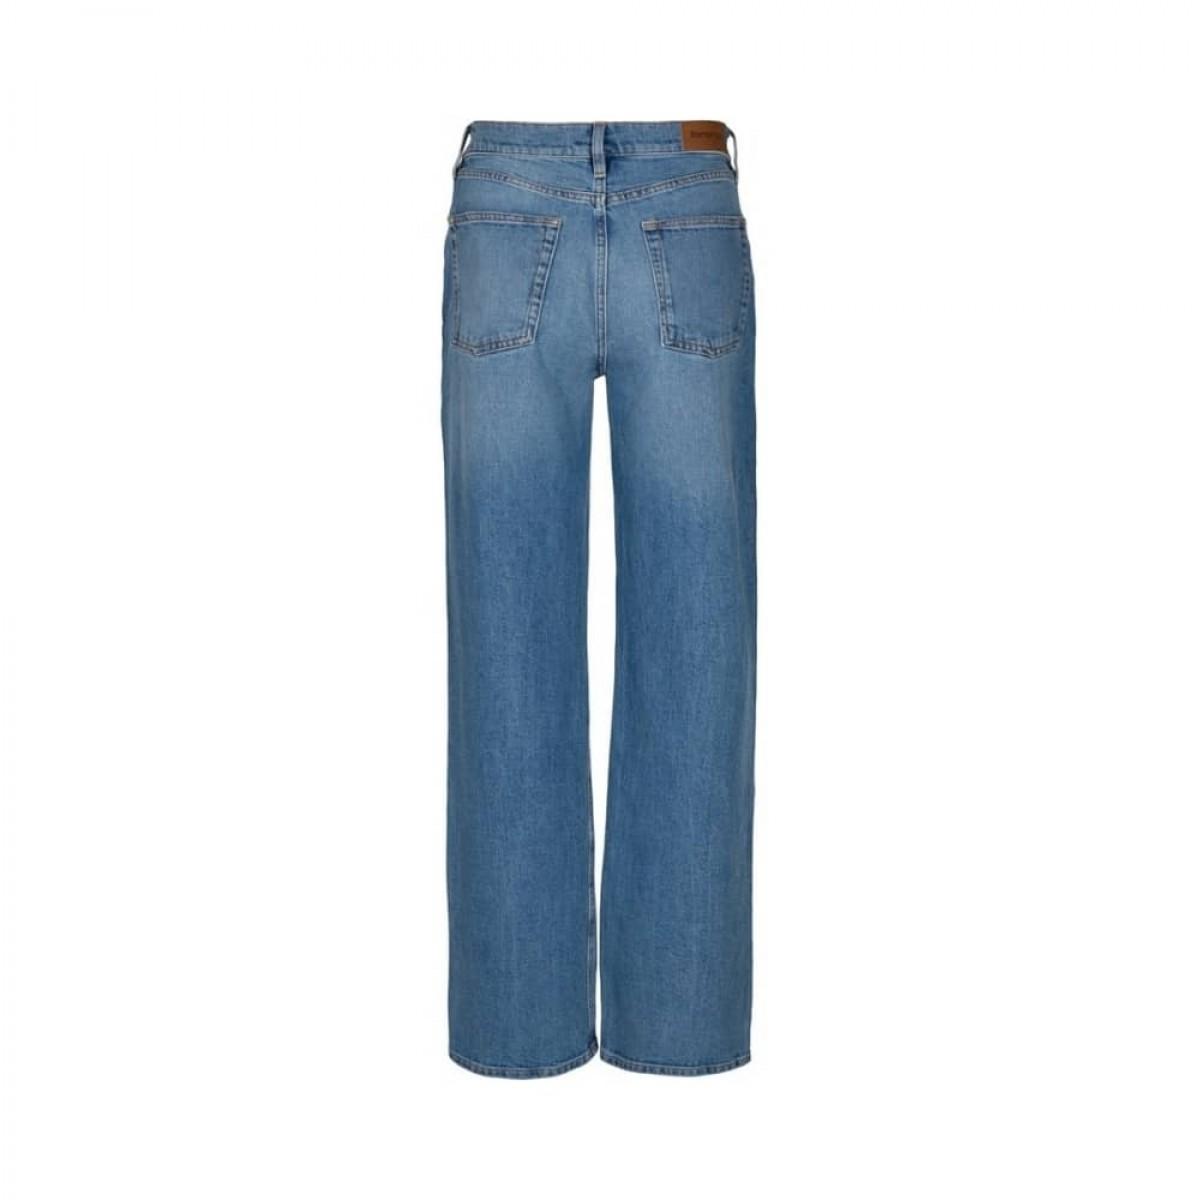 brown straight jeans - light blue - bag